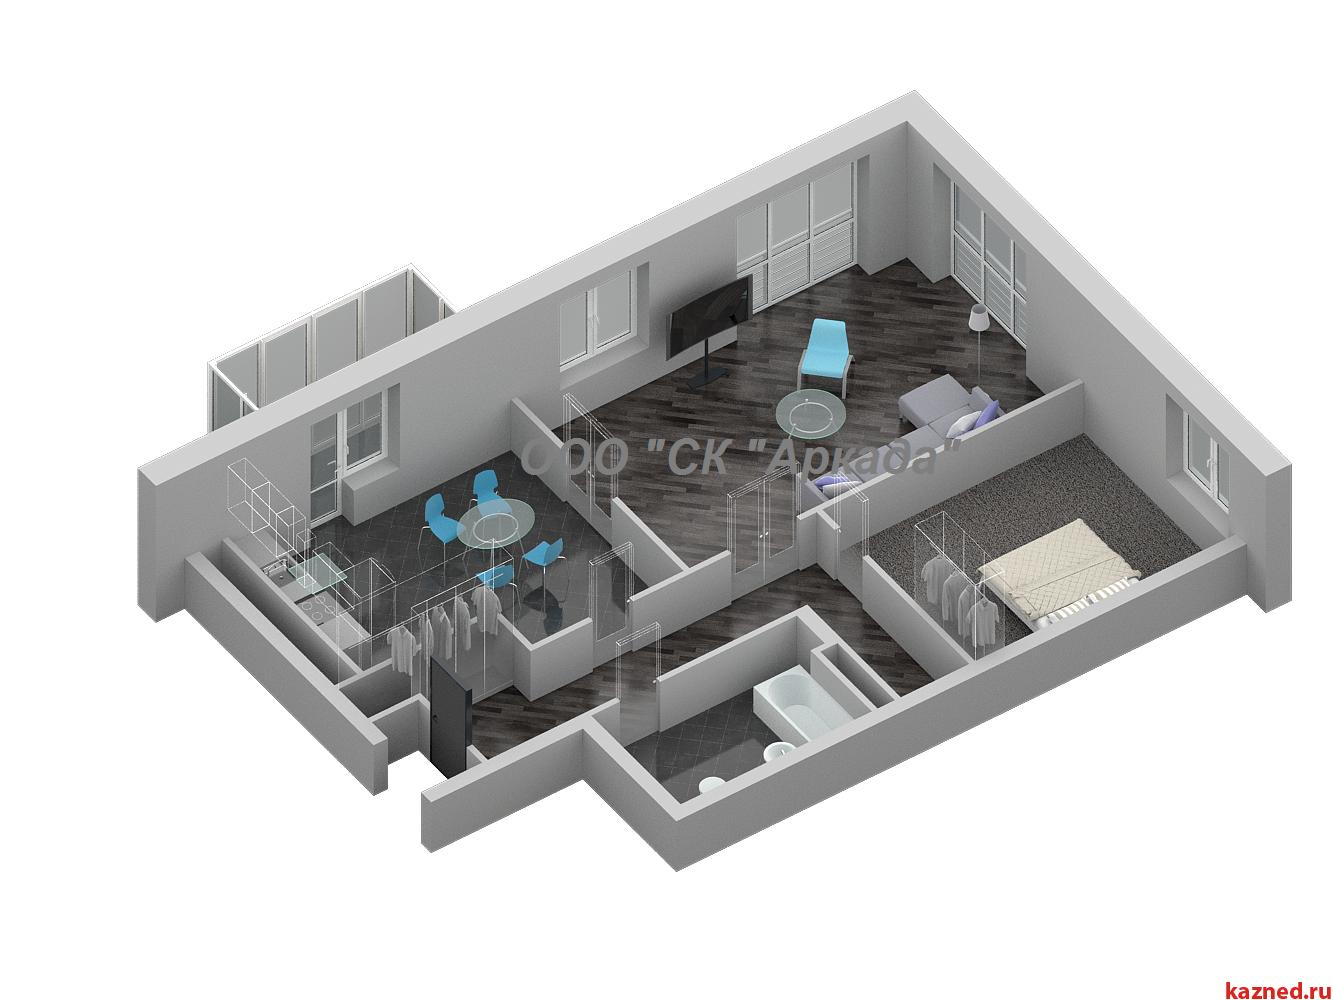 Продажа 3-к квартиры Шуртыгина, д. 7, 88 м2  (миниатюра №1)